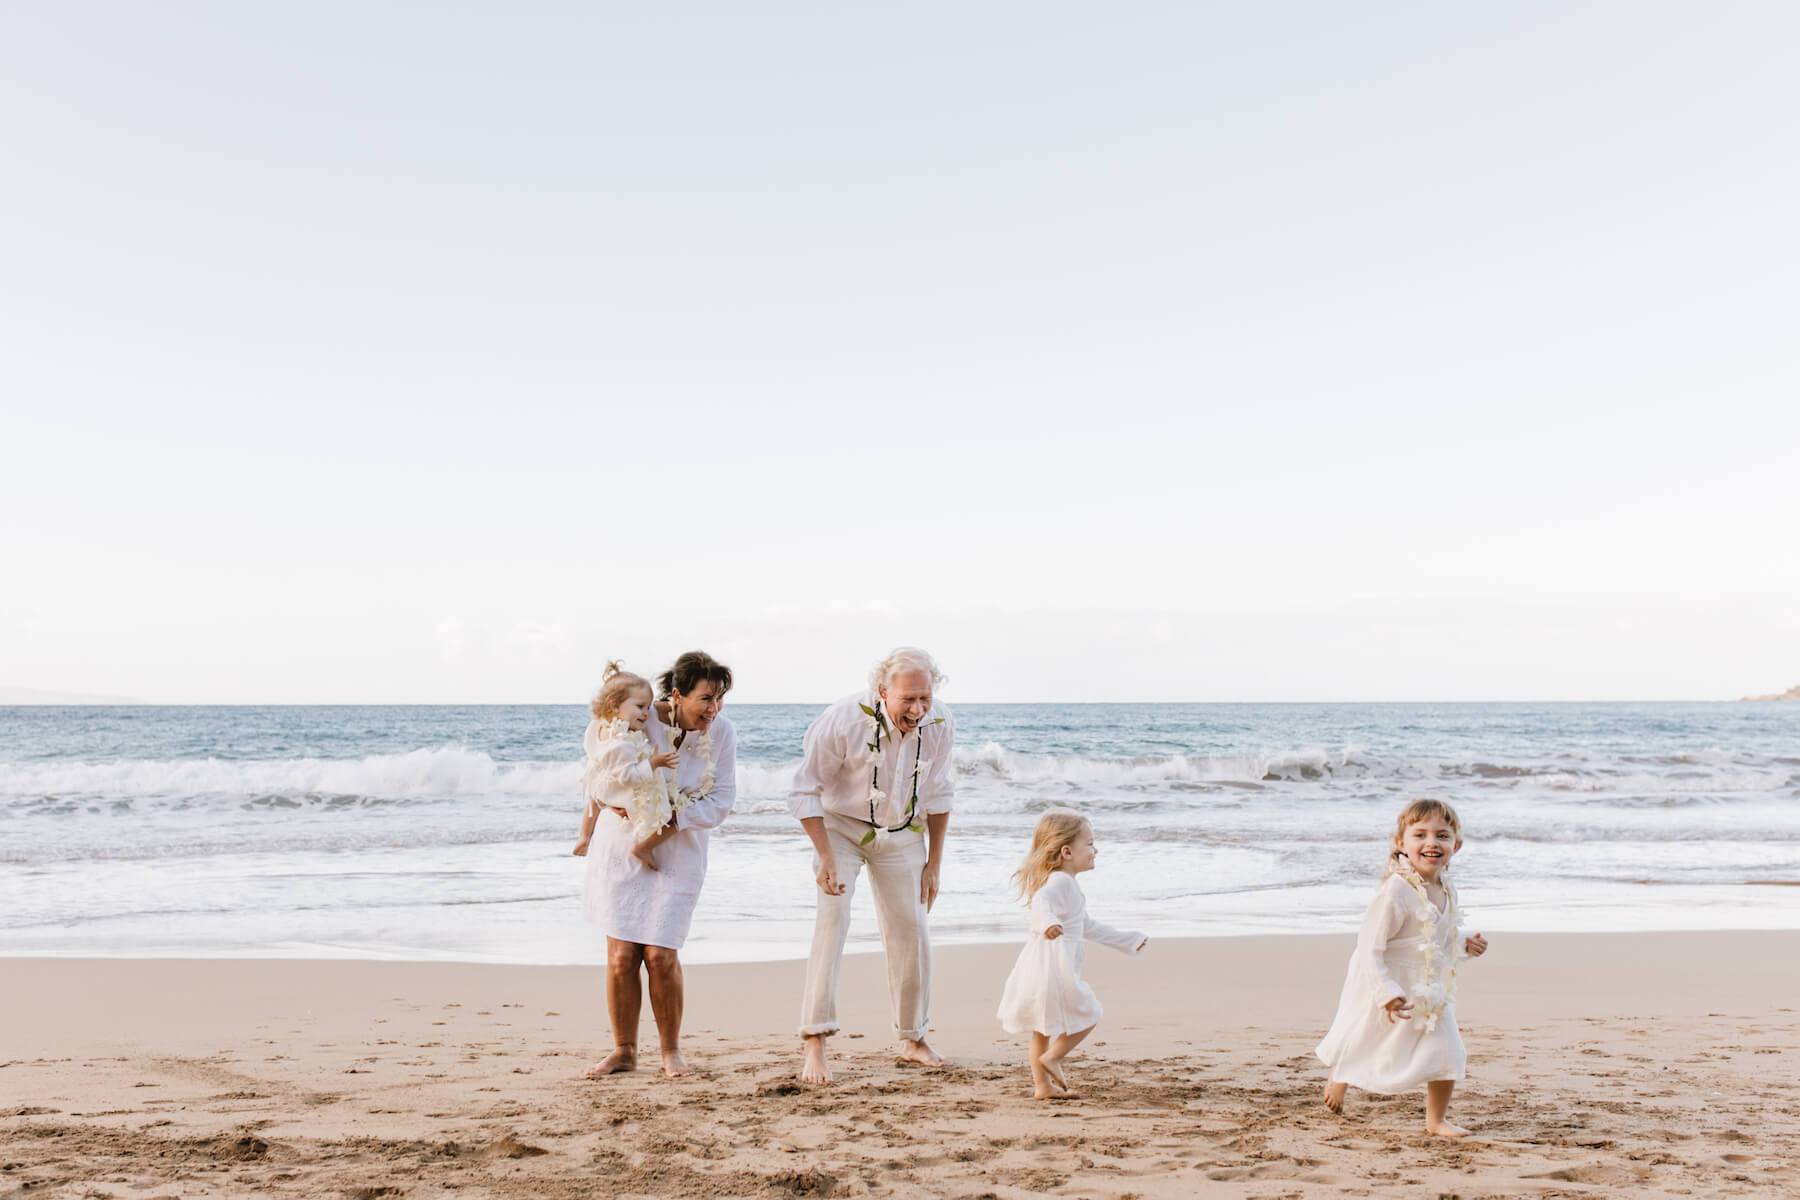 multi-generational family photo shoot in Maui Hawaii